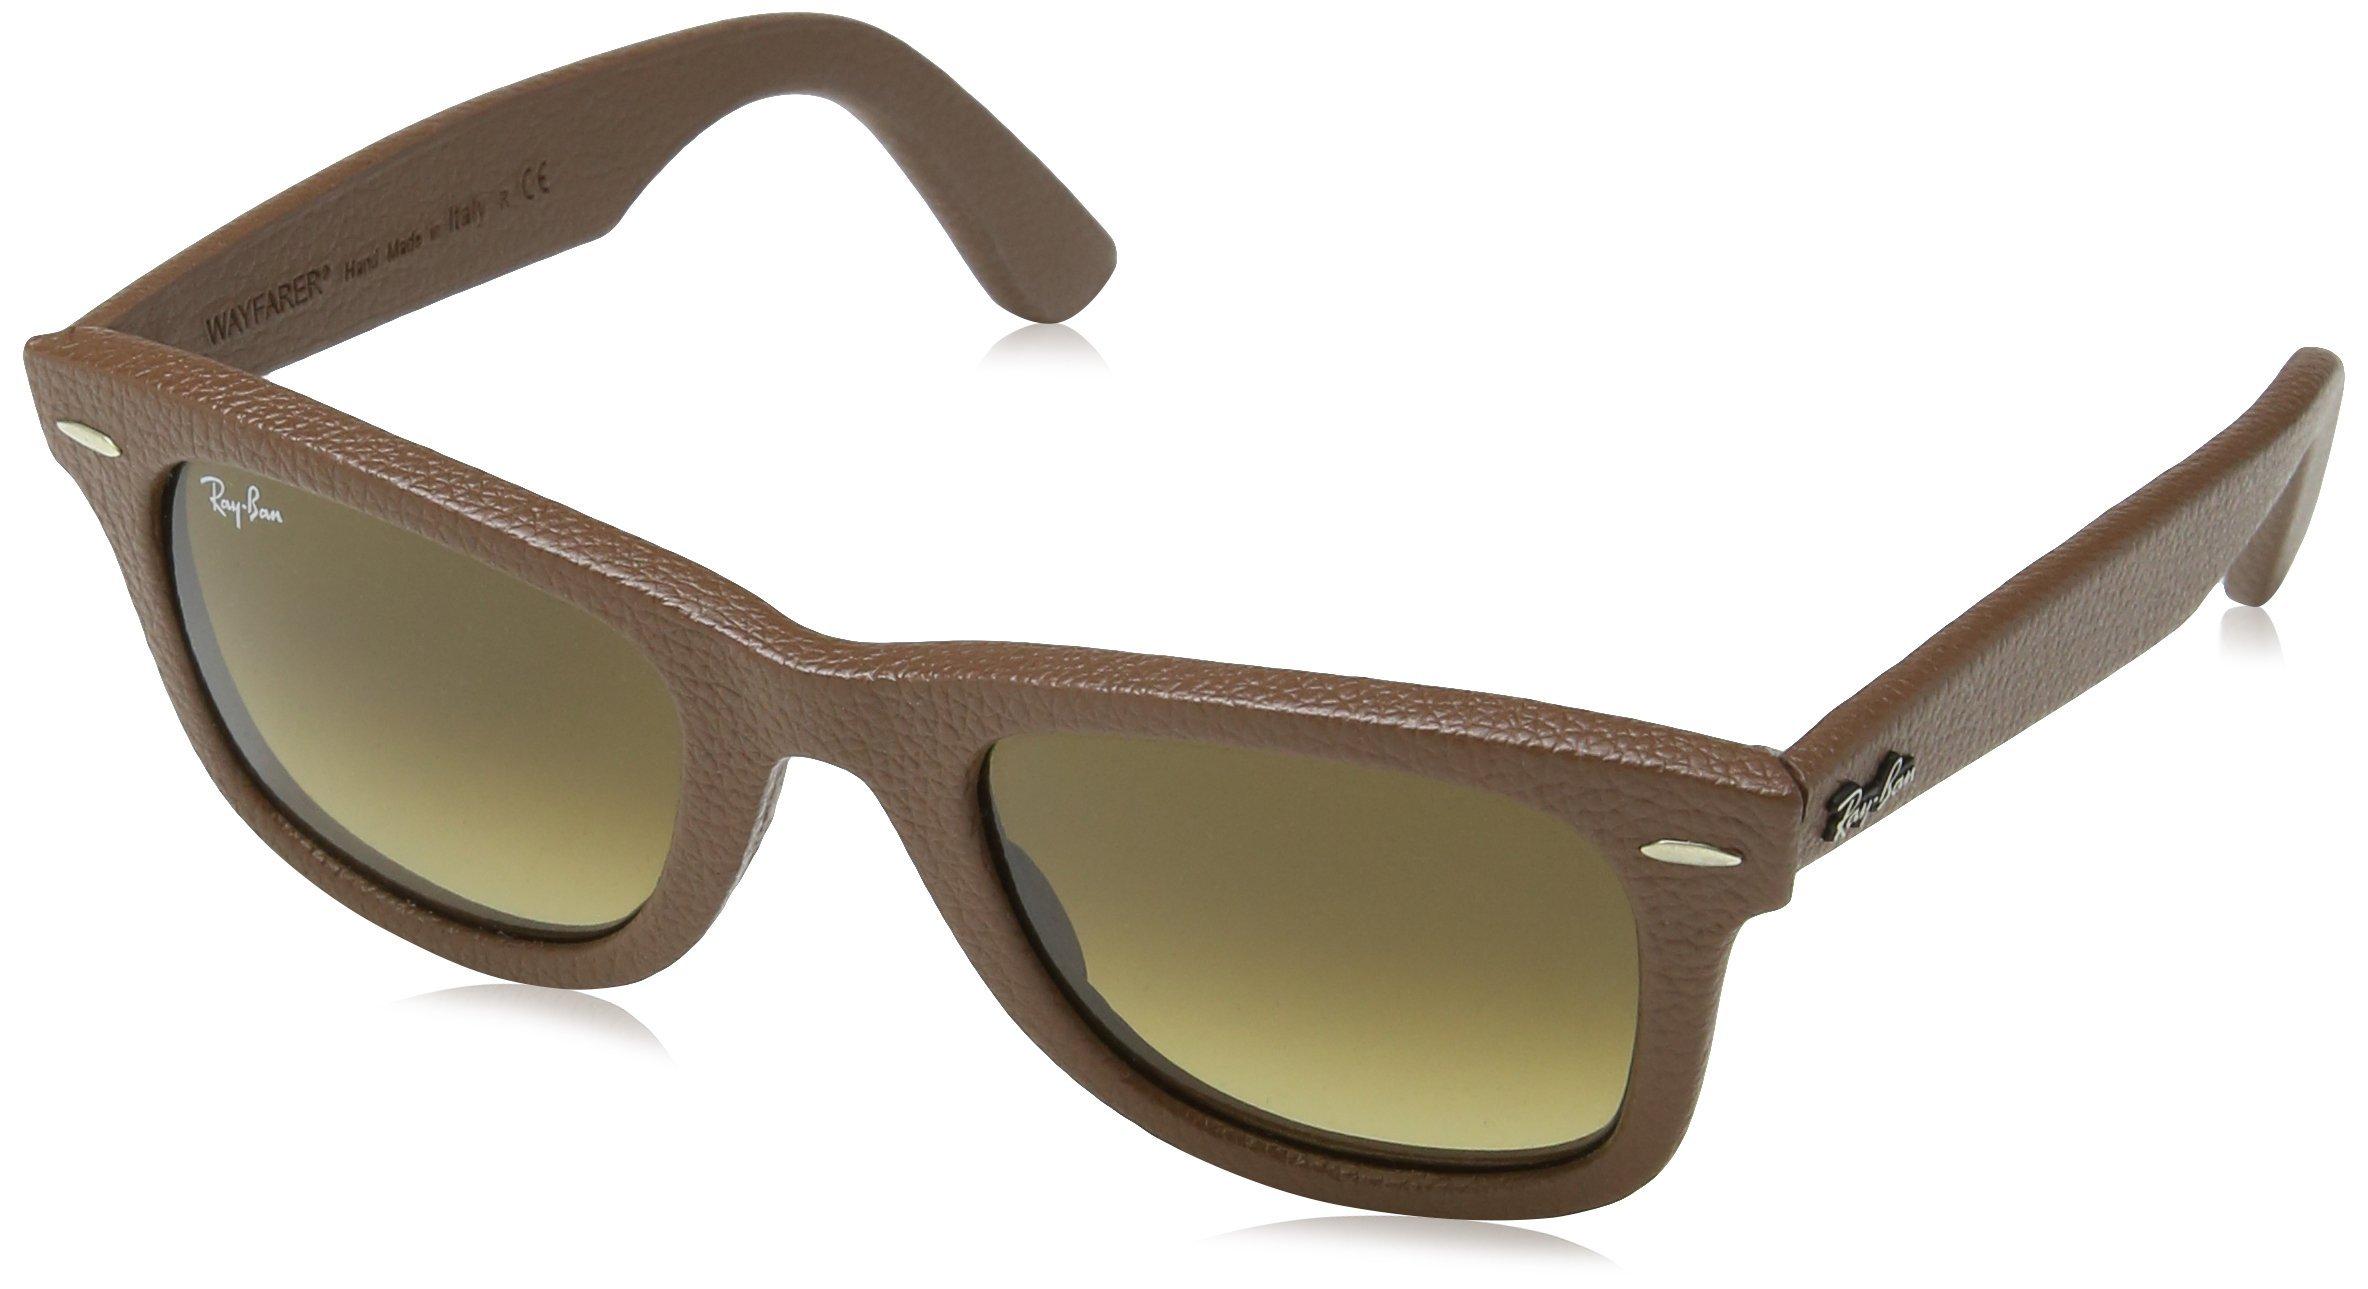 Ray-Ban 2140QM 116985 Leather Brown Wayfarer Sunglasses